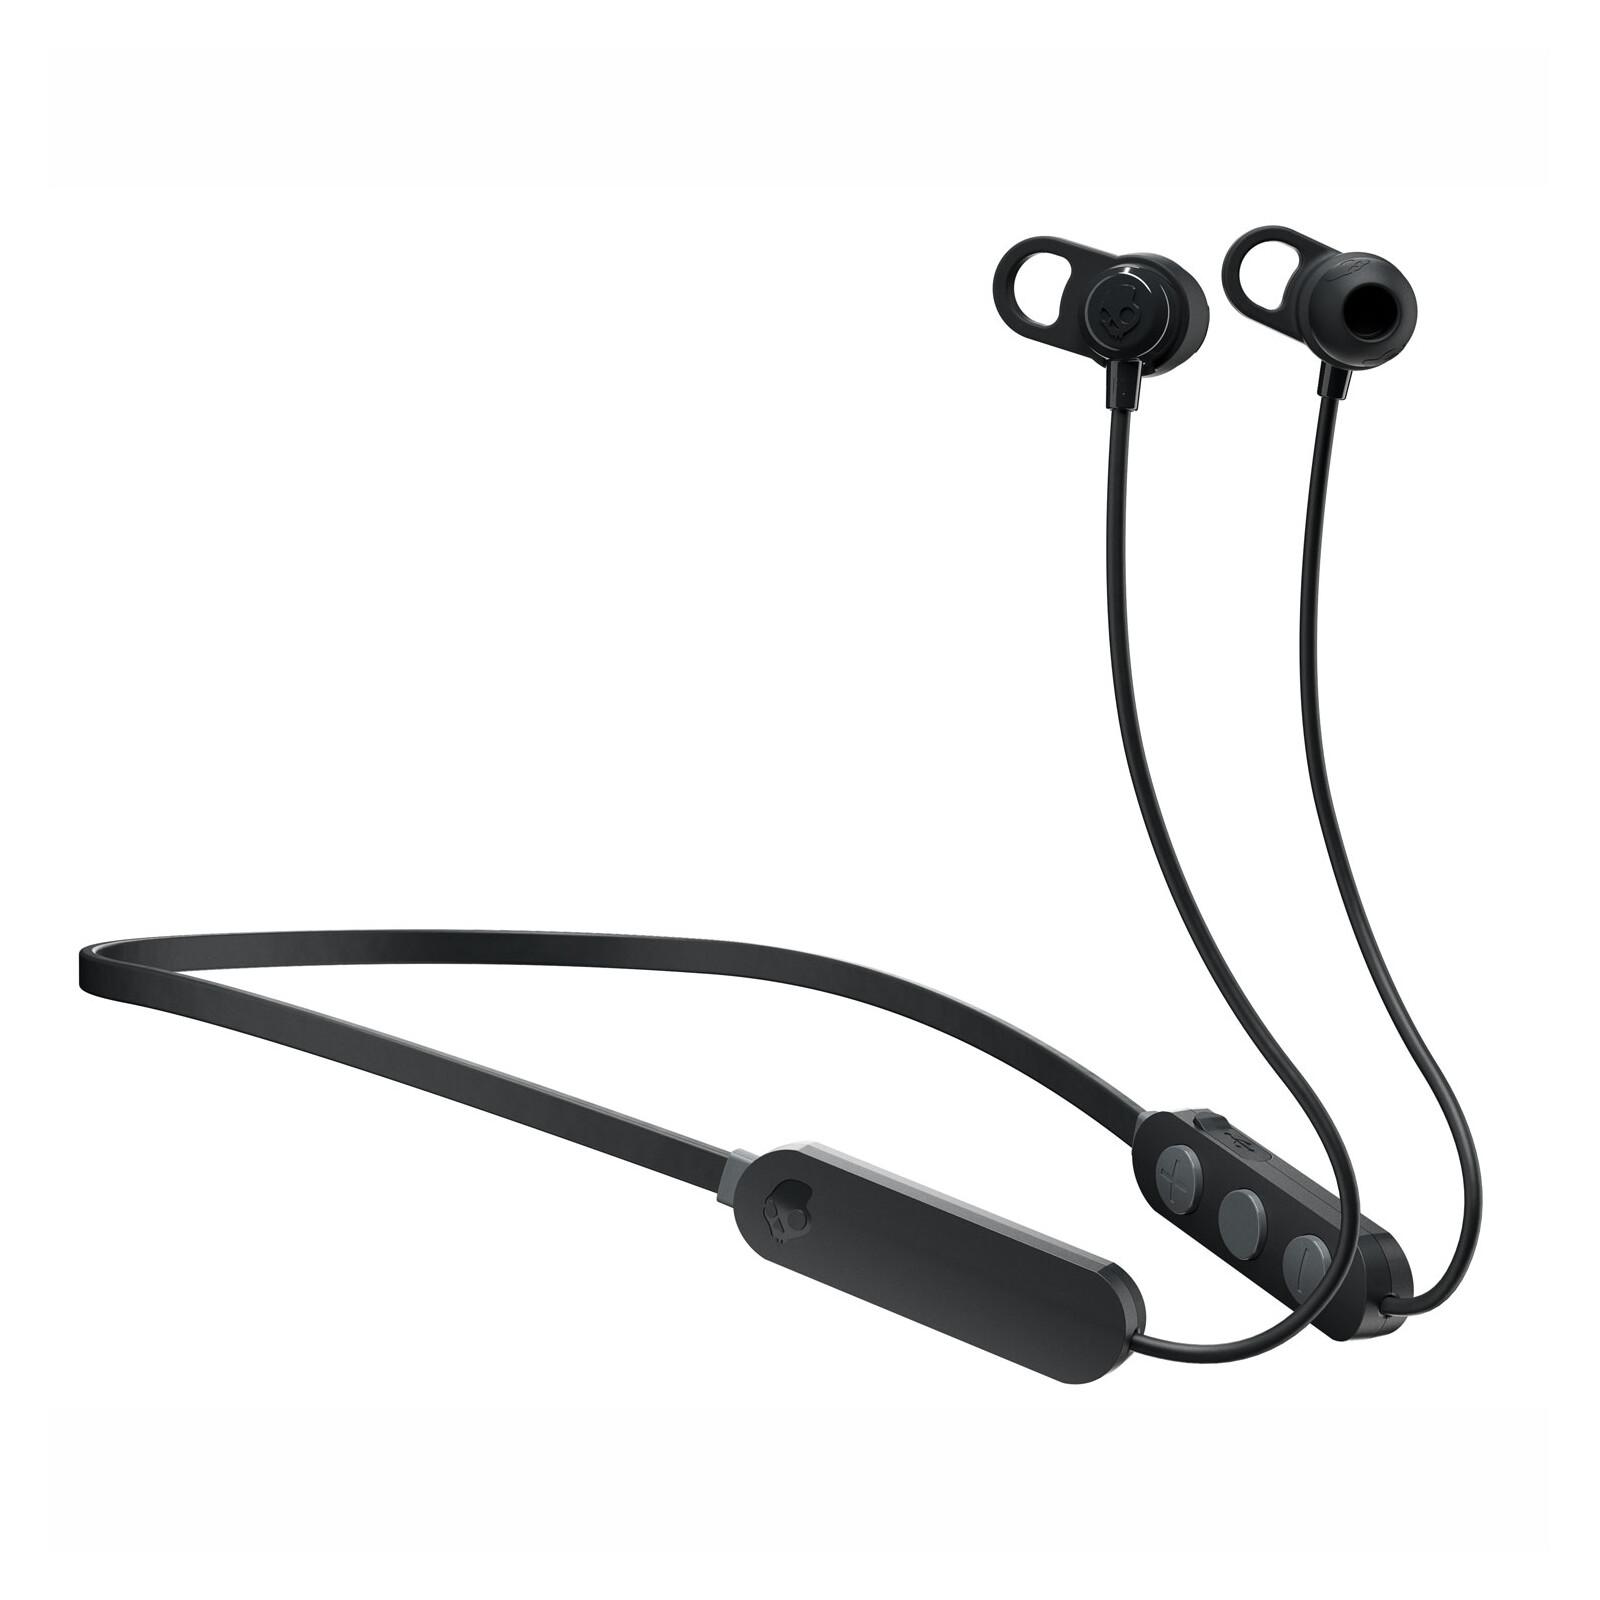 Skullcandy JIB+ Bluetooth In-Ear